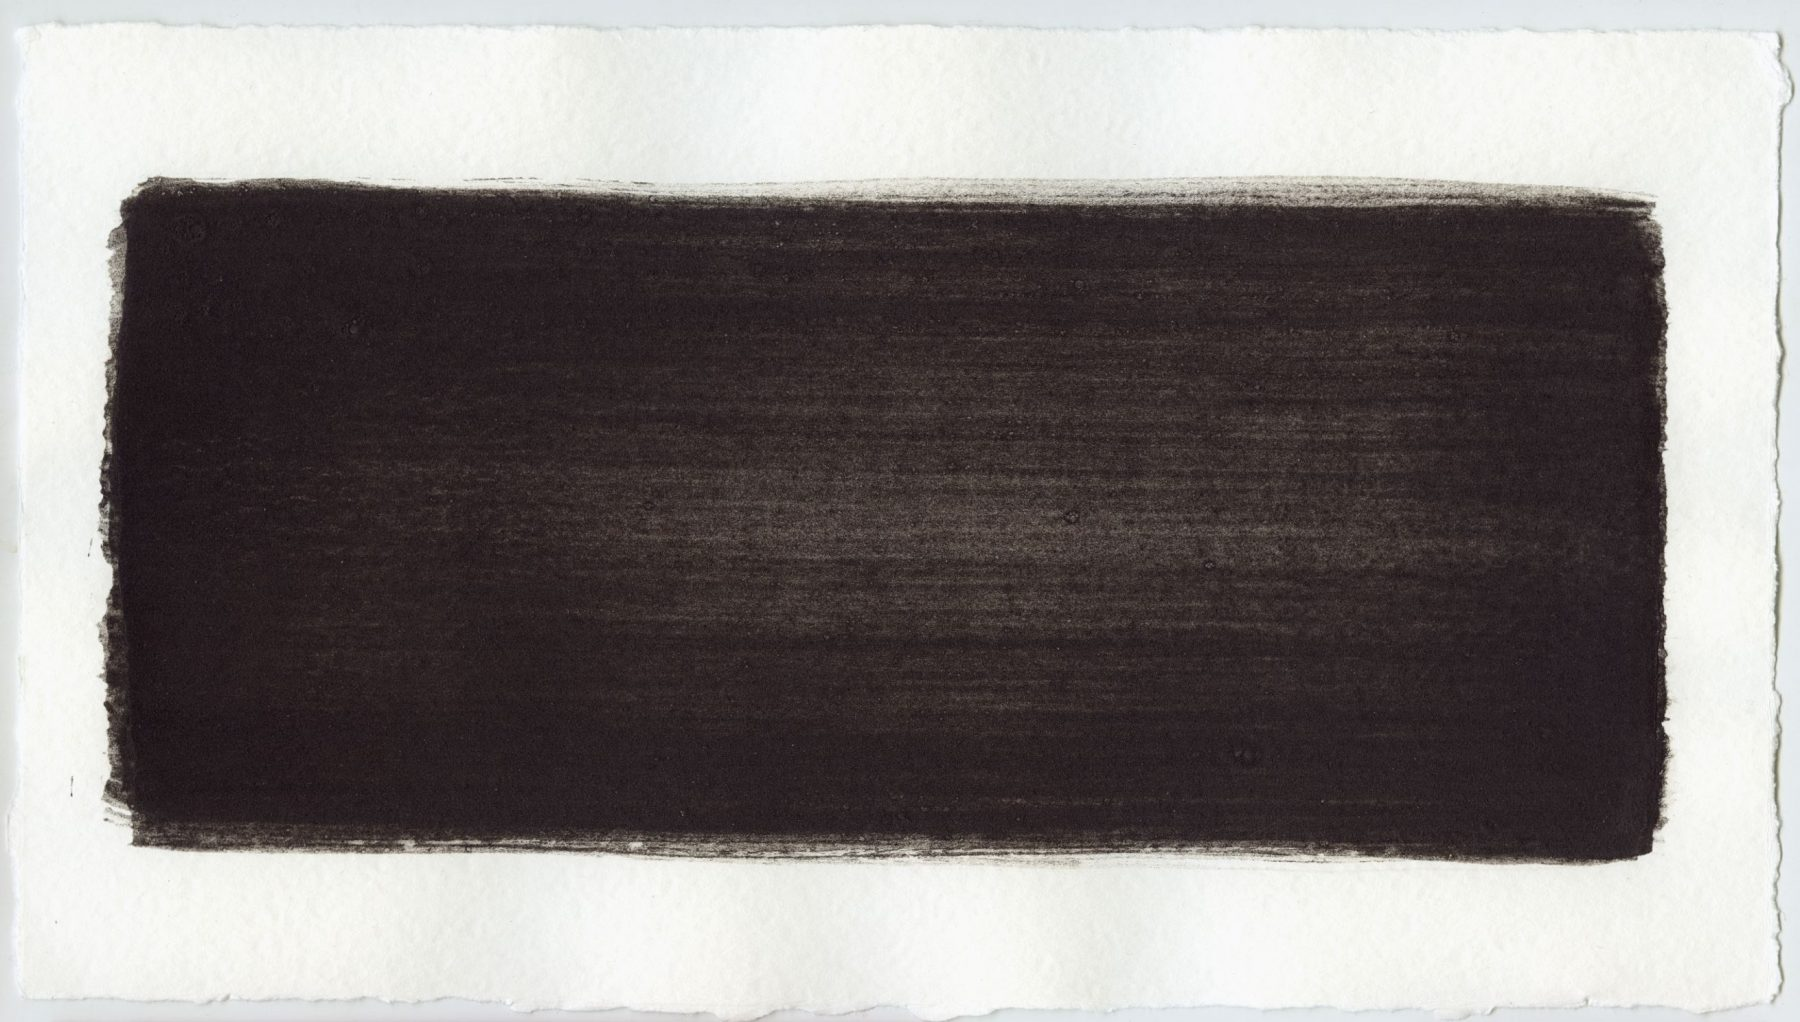 Brush stroke no. 15 - SOLD - Selfmade pigment: Mortel paarsgrijs middel